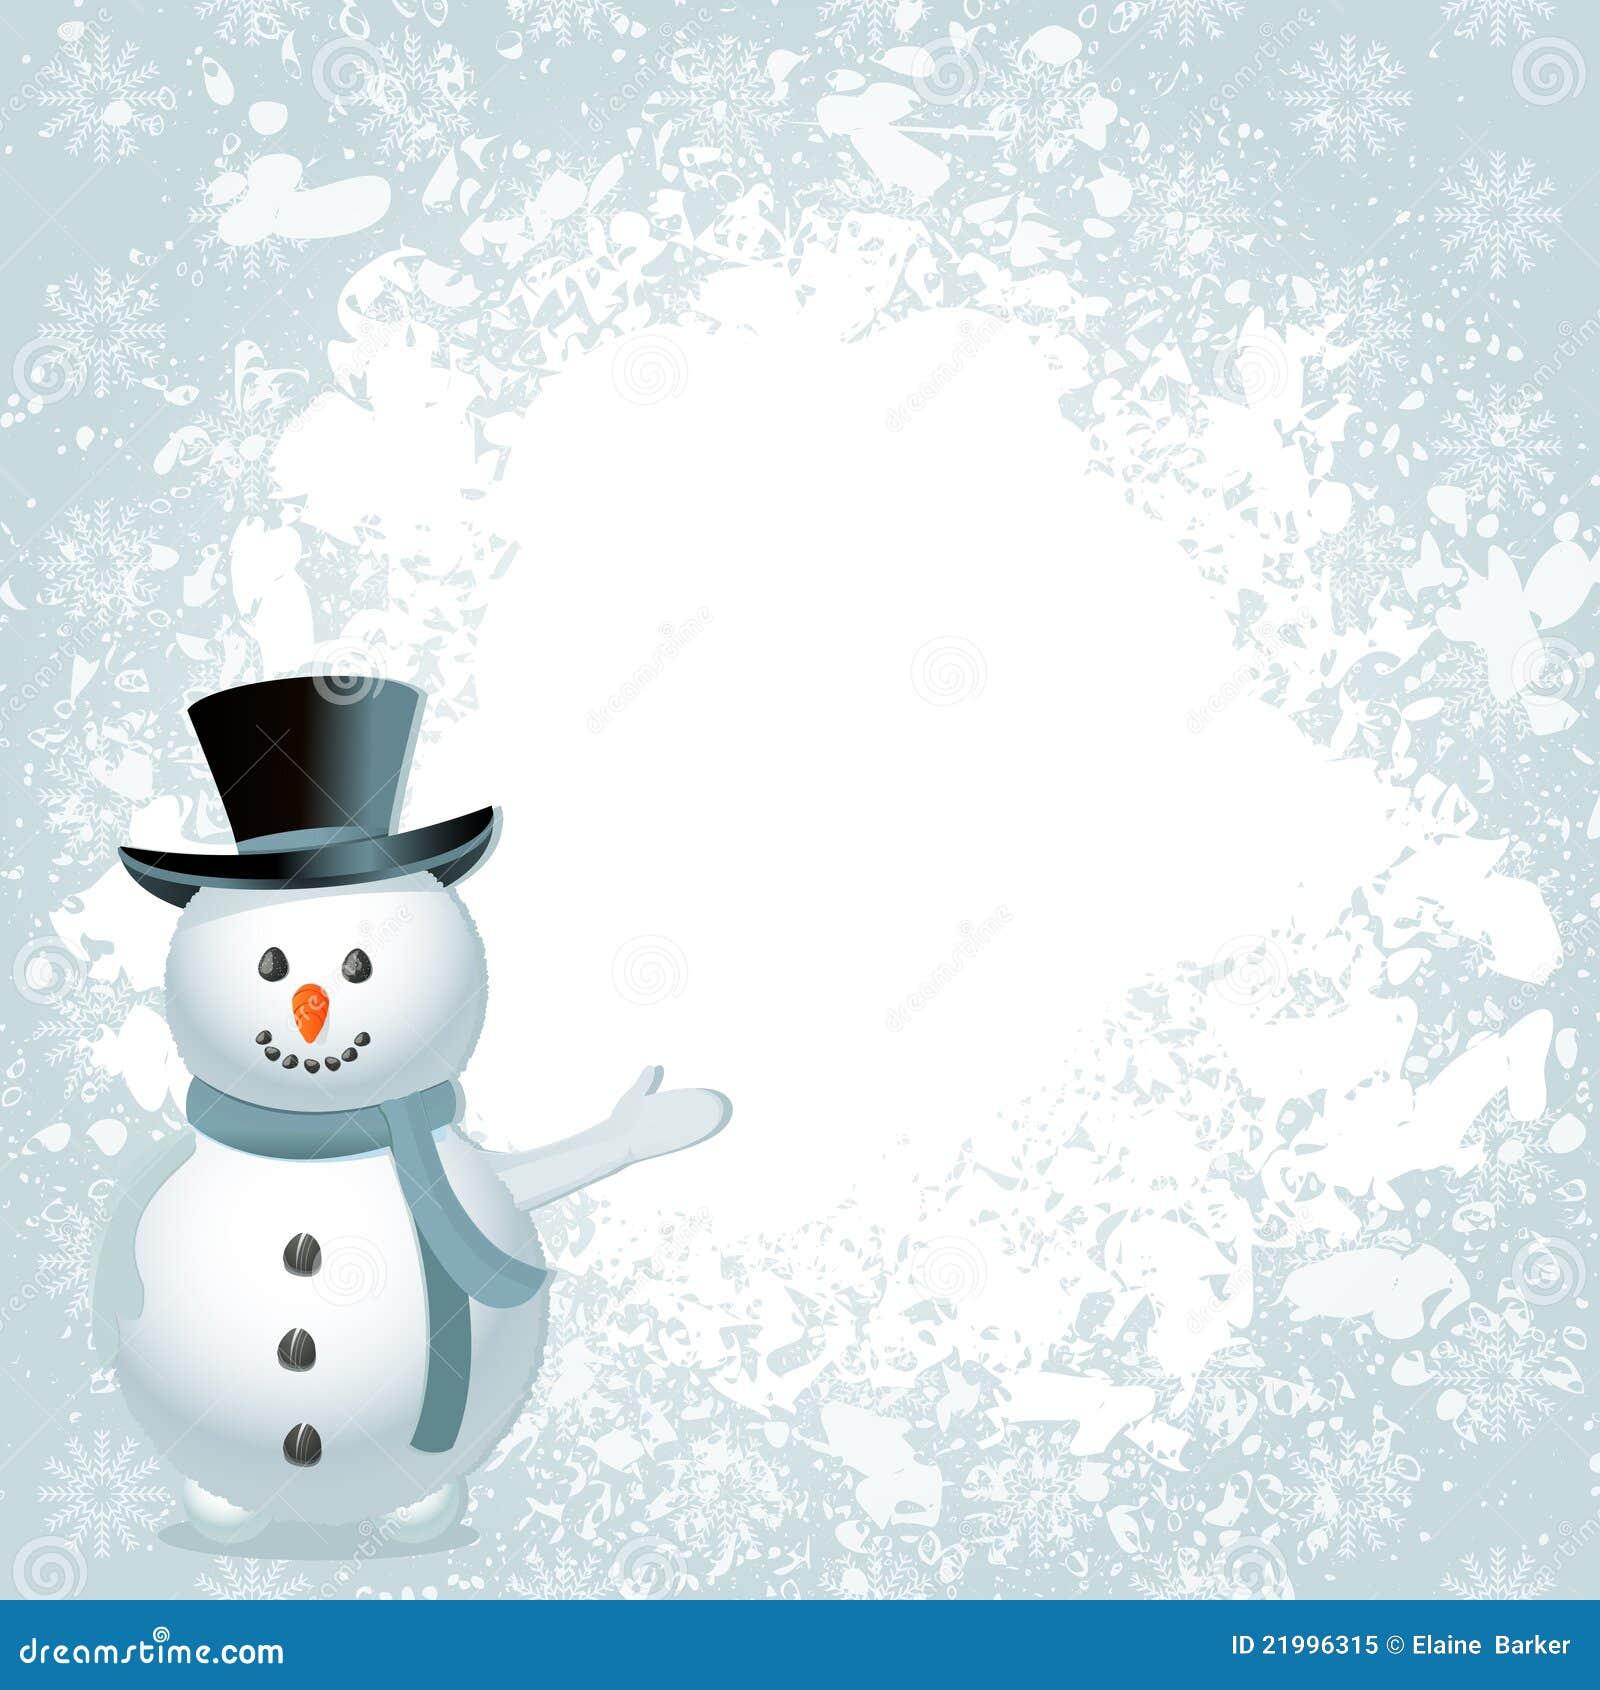 christmas snowman background 21996315